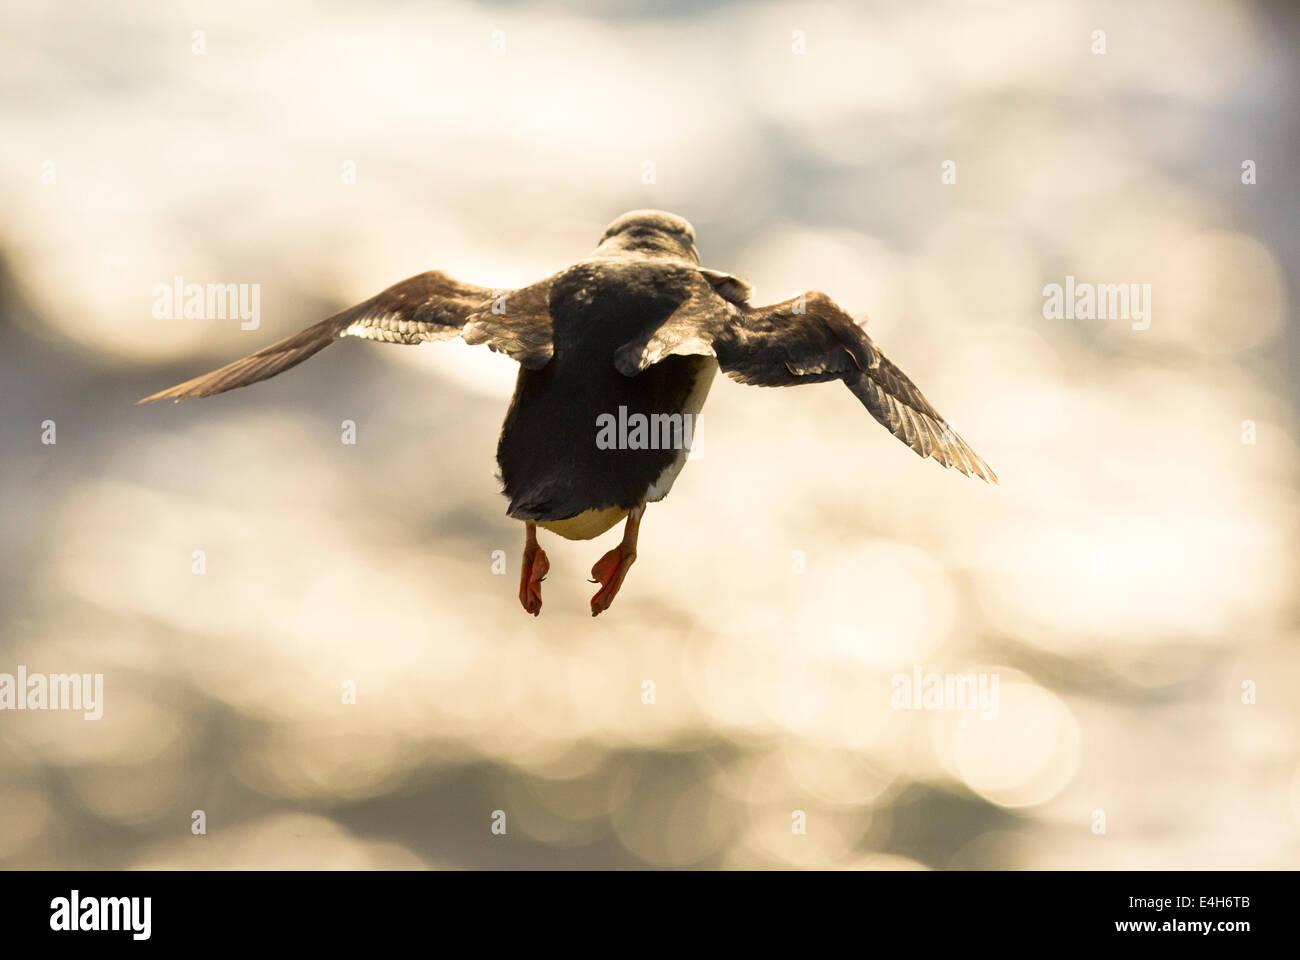 An Atlantic Puffin (Fratercula arctica) in flight. Stock Photo